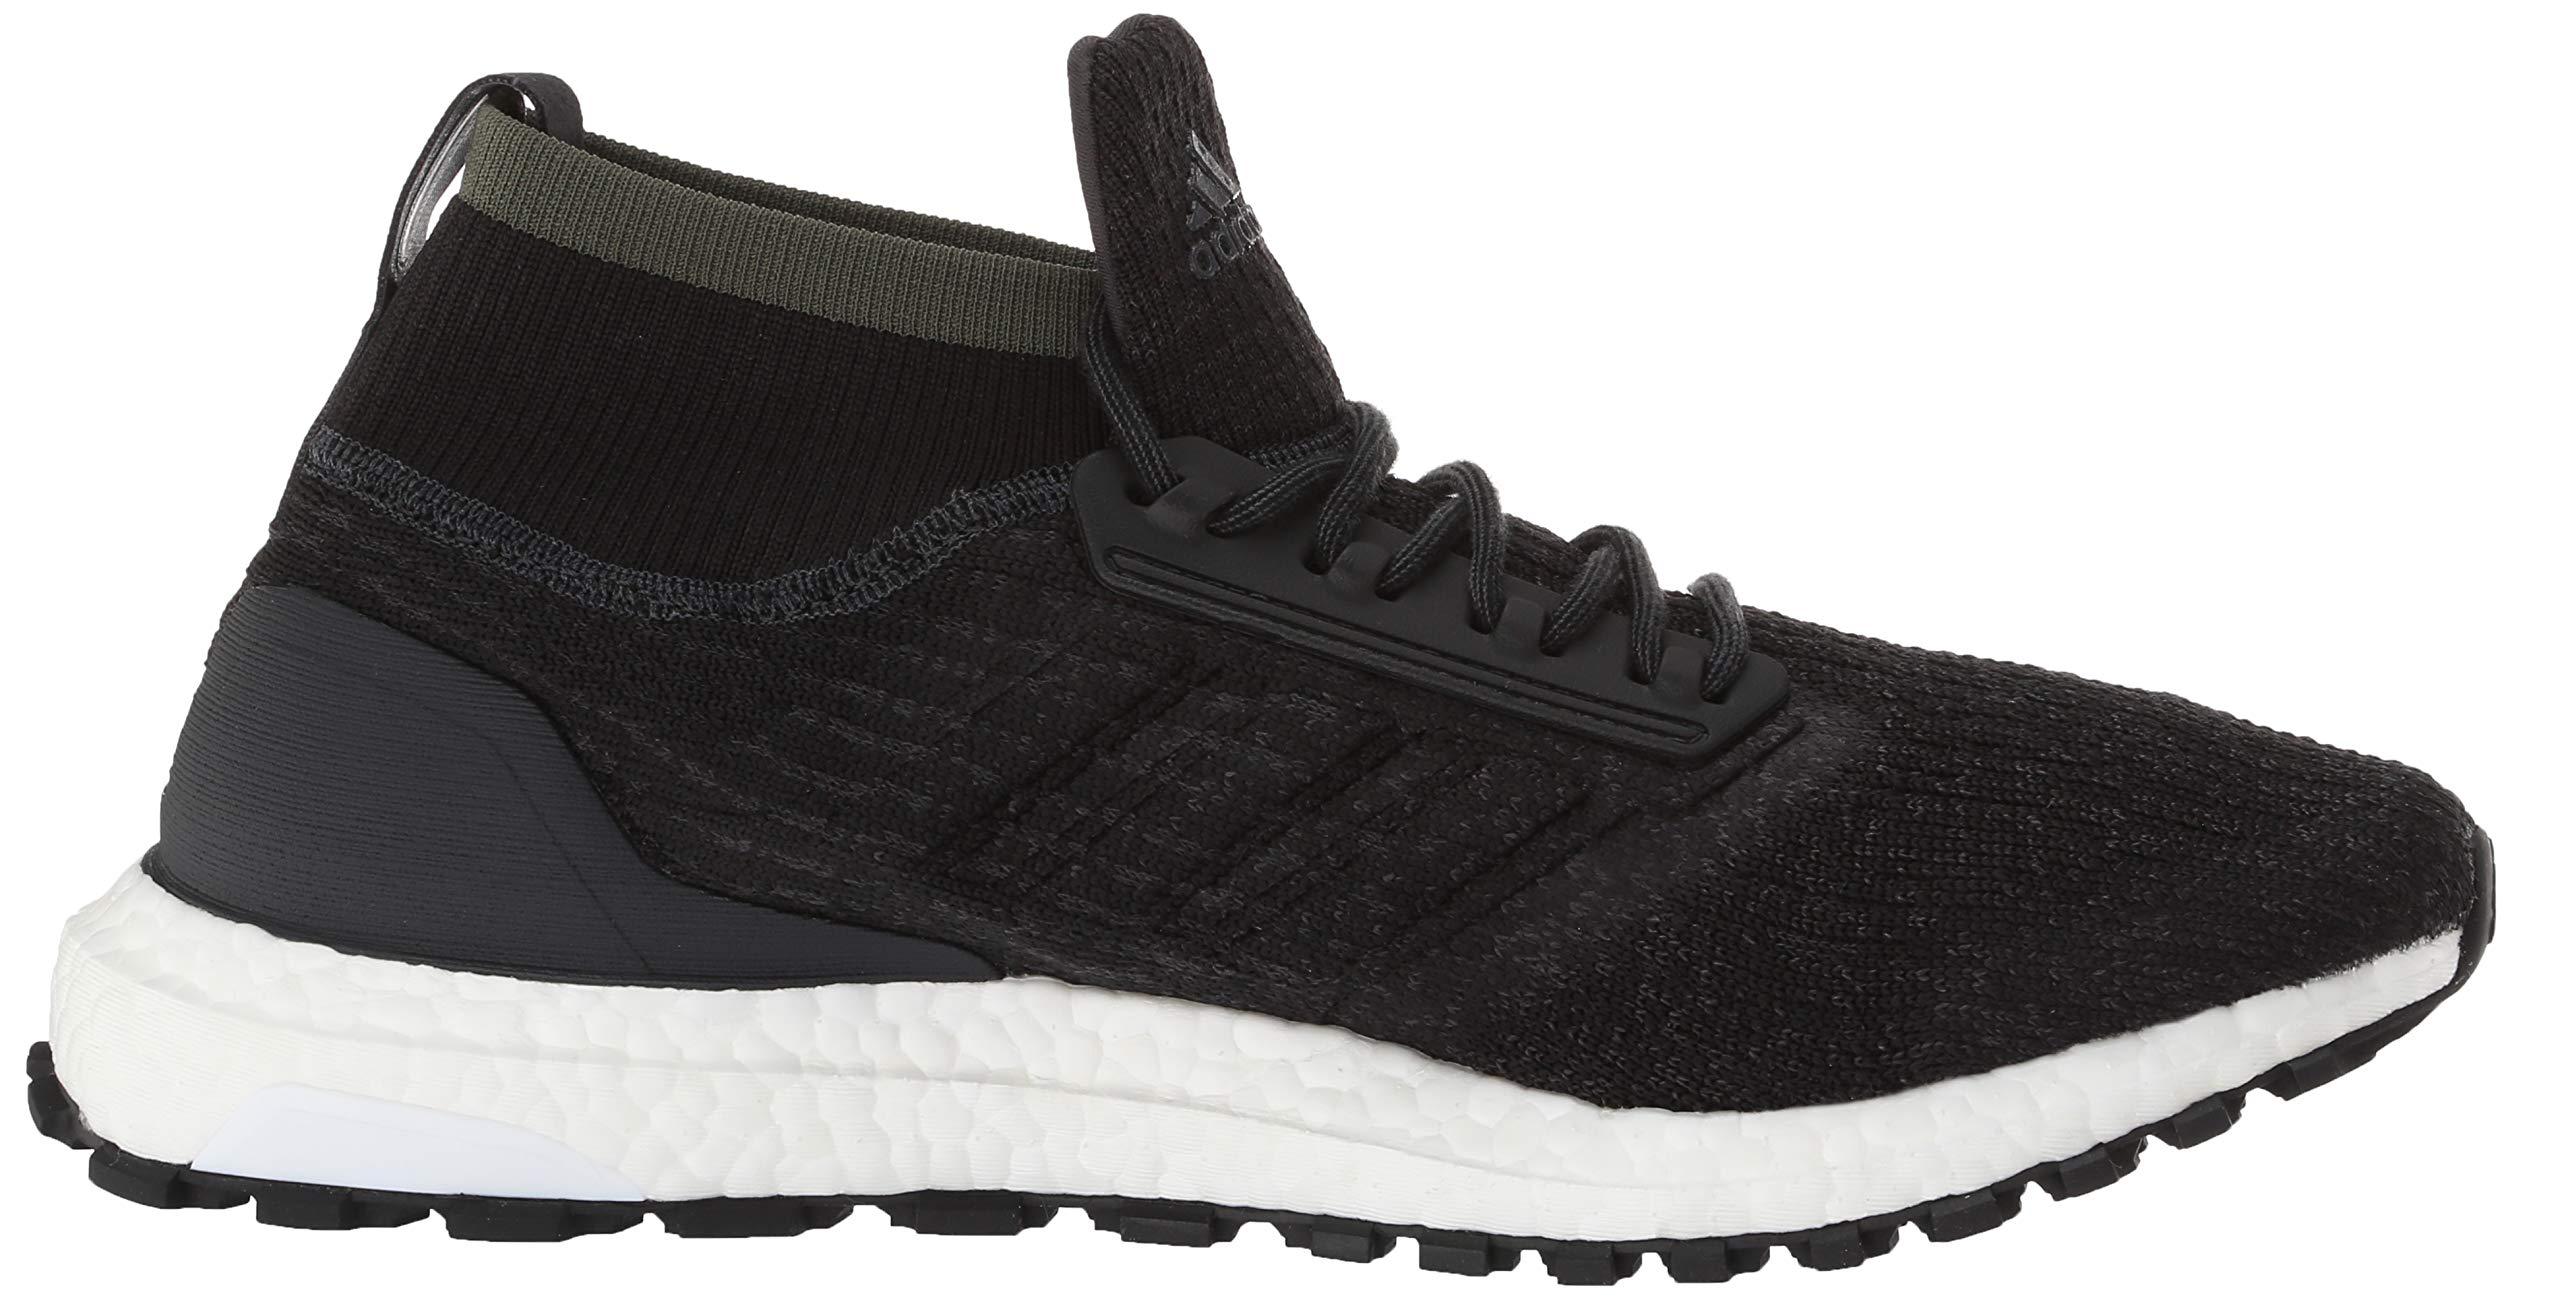 71hlzj1yG6L - adidas Men's Ultraboost All Terrain Running Shoe